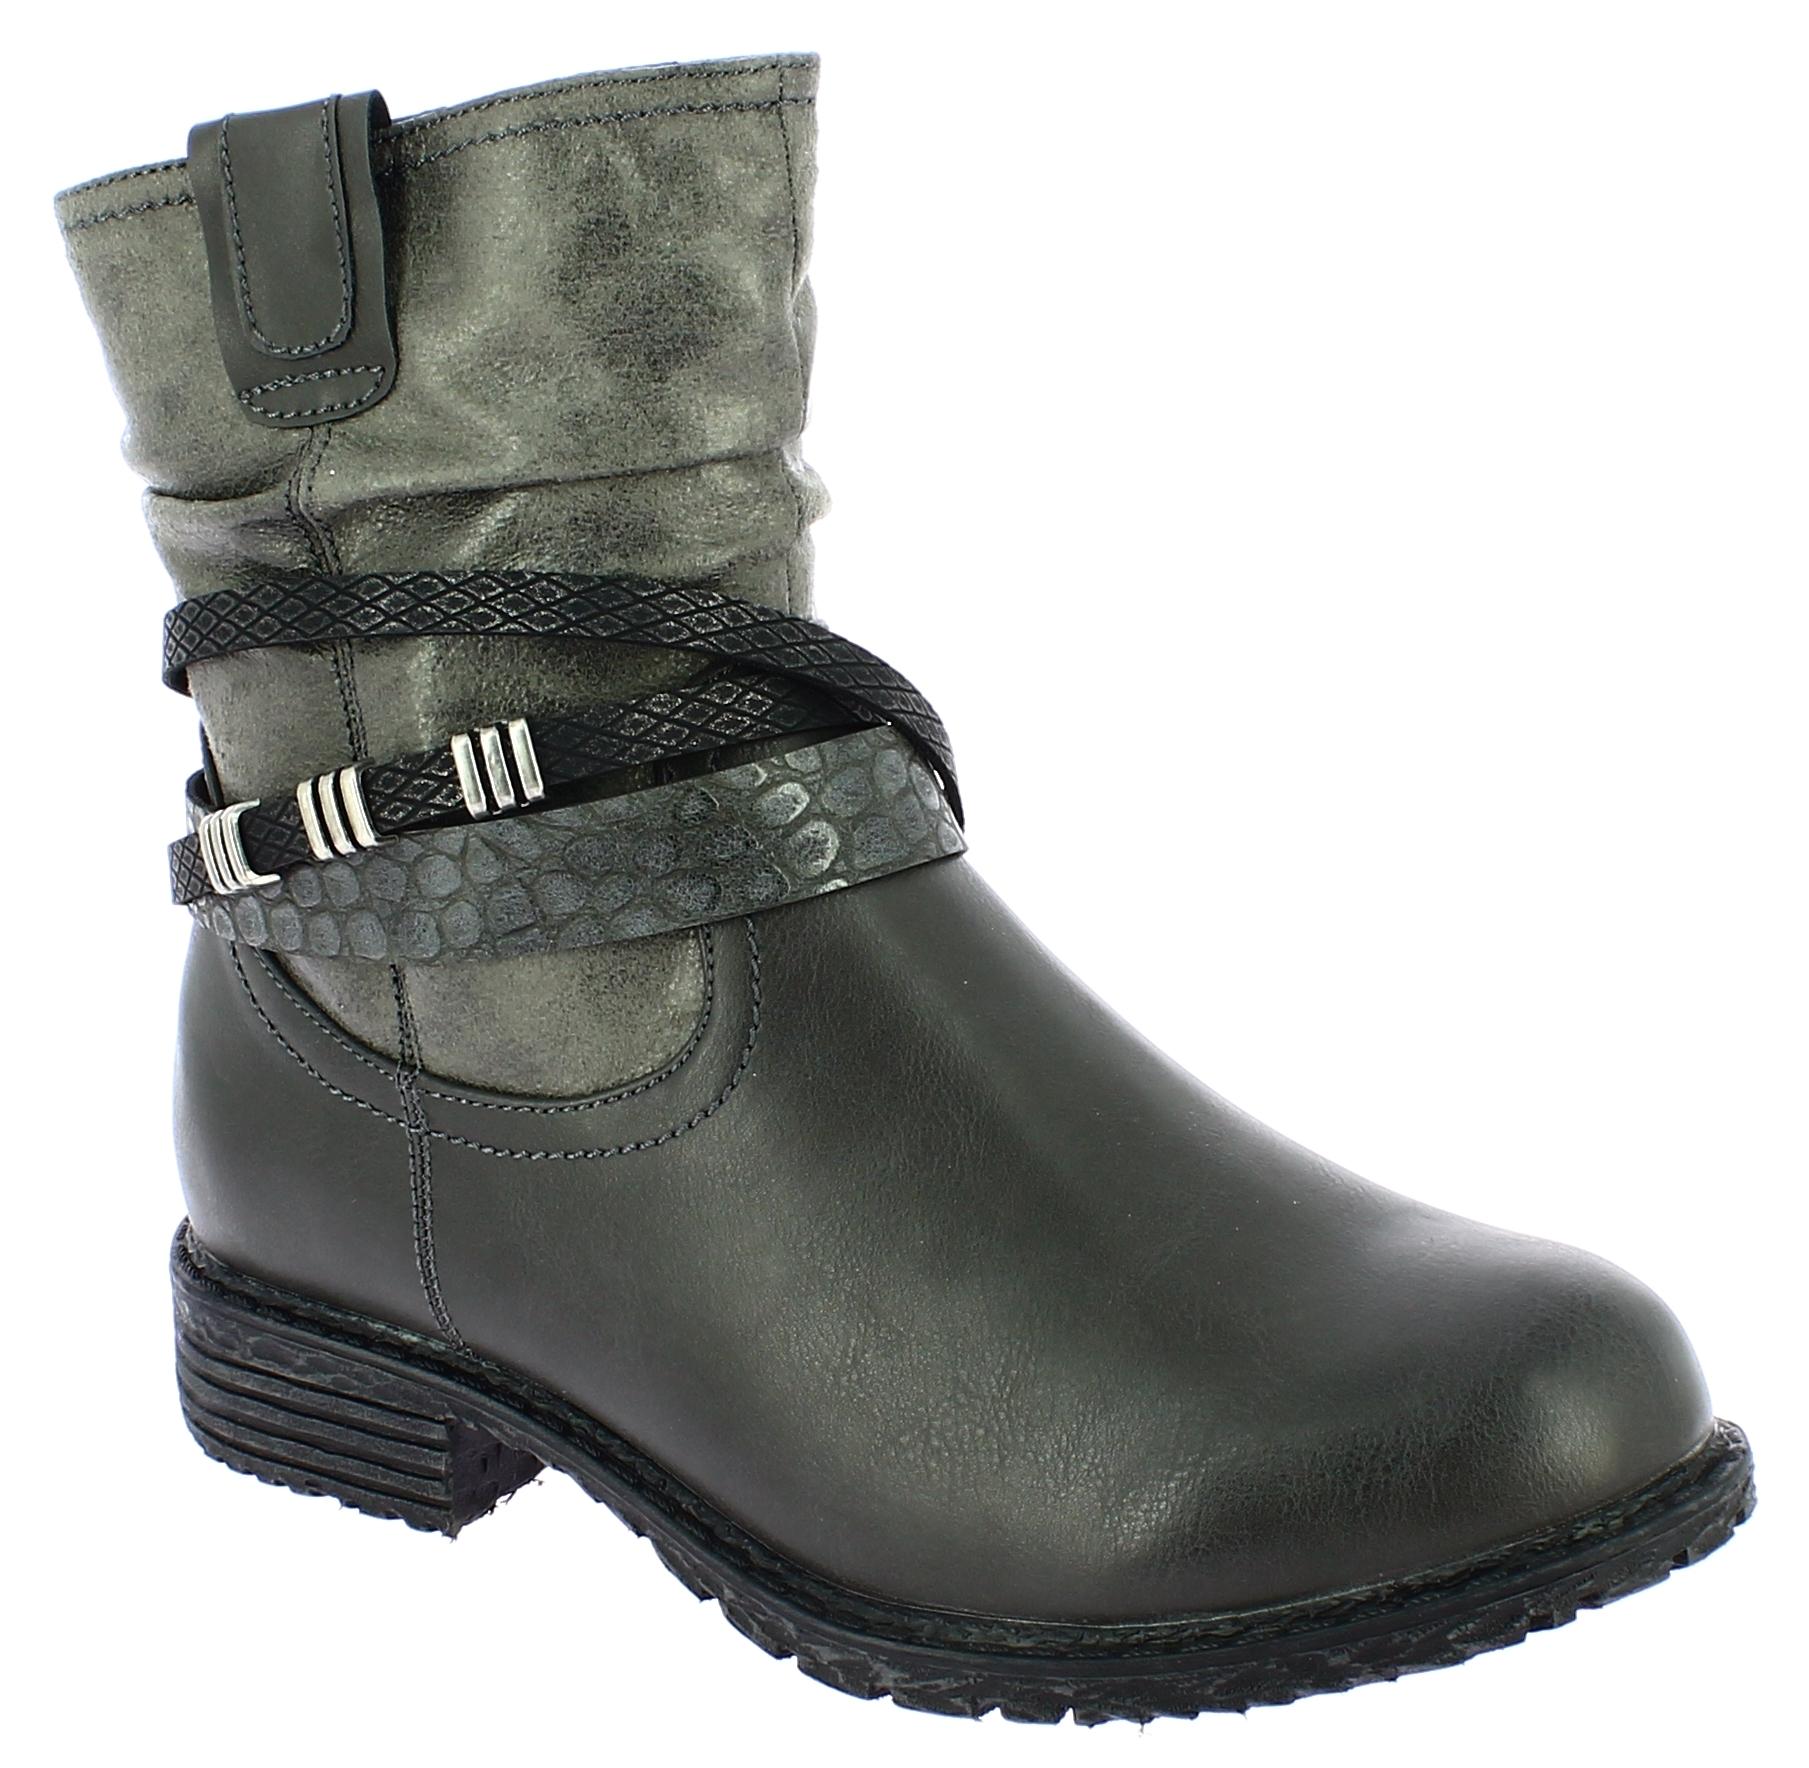 SCANDI Γυναικείο Μποτάκι 56-0170-C1 Γκρι - SCANDI - 56-0170-C1 GREY -SCANDI-grey παπούτσια  new in